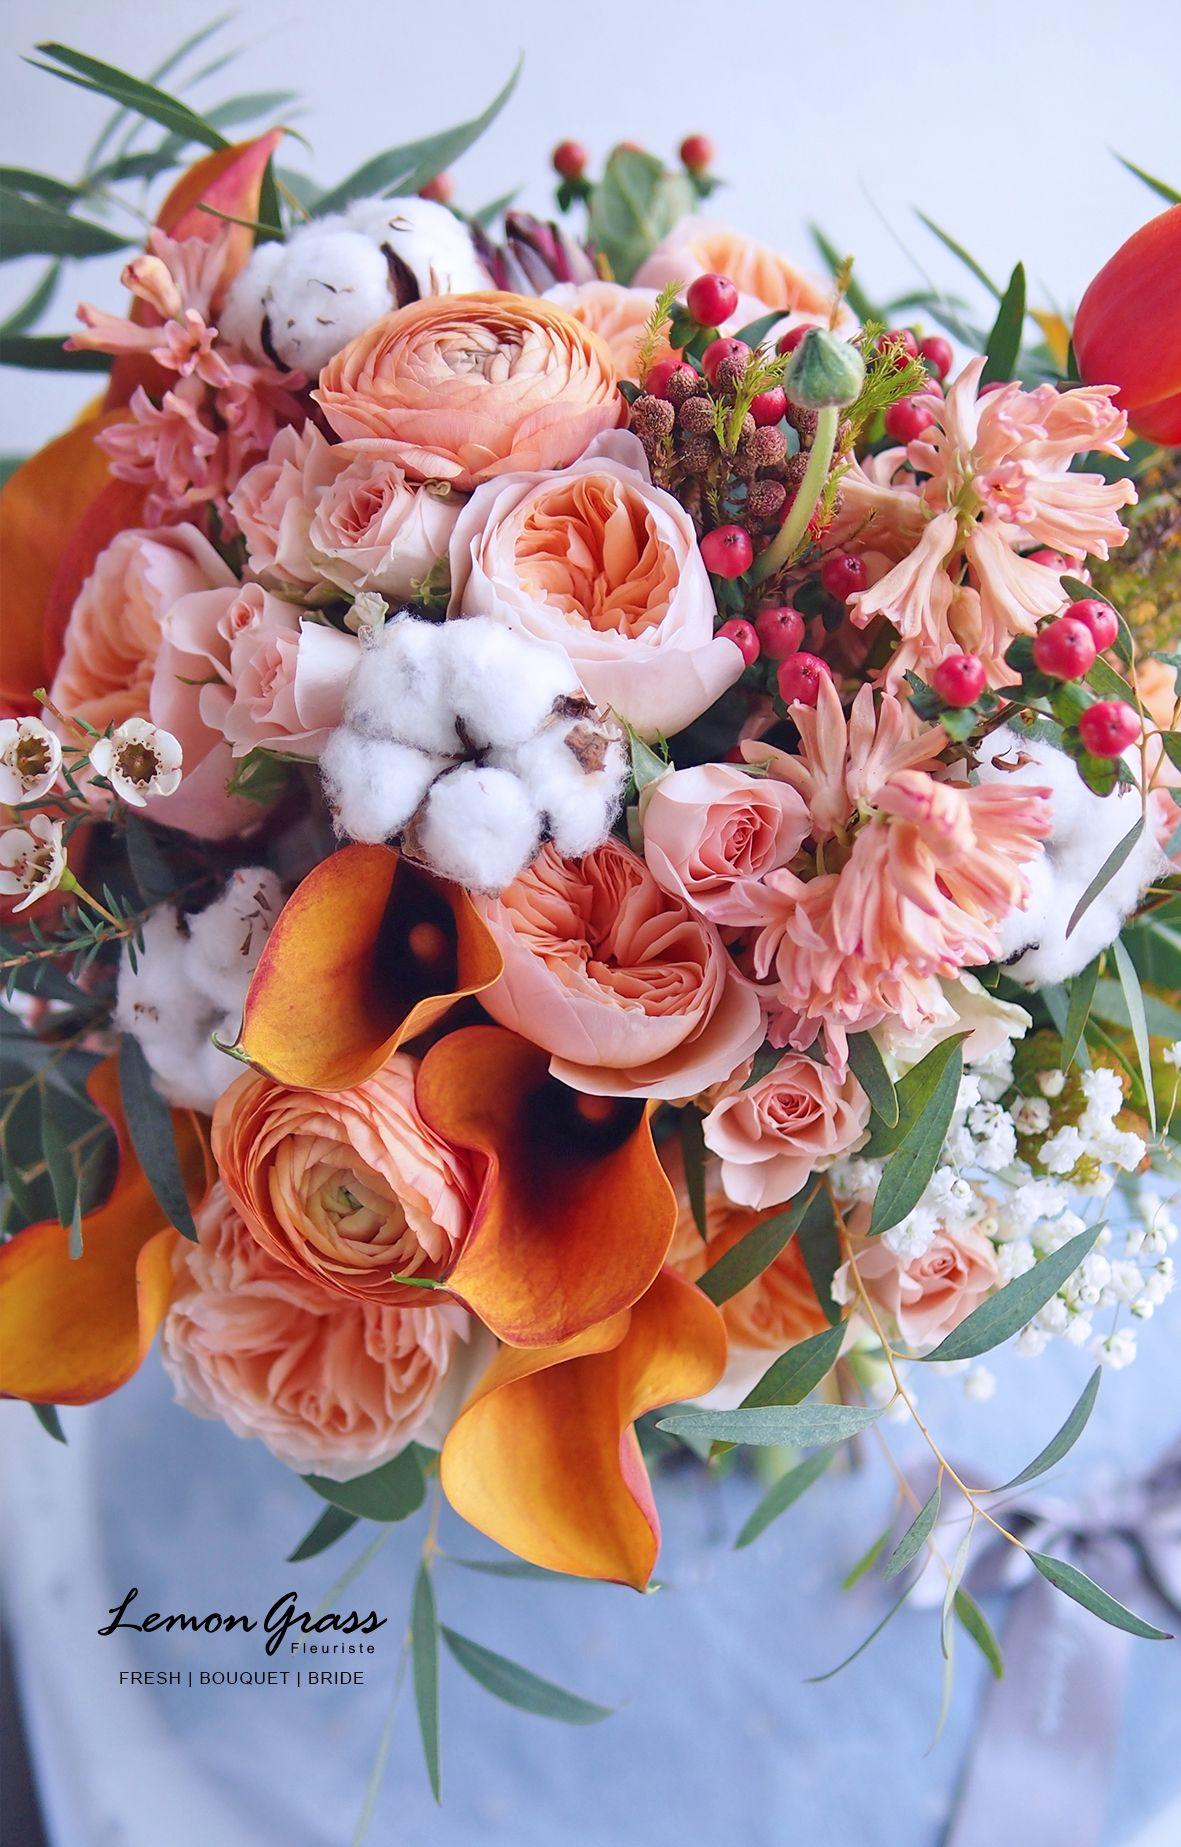 Pin by lemongrasswedding on fresh flower bouquets pinterest bunch of flowers fresh flowers flower bouquets floral bouquets izmirmasajfo